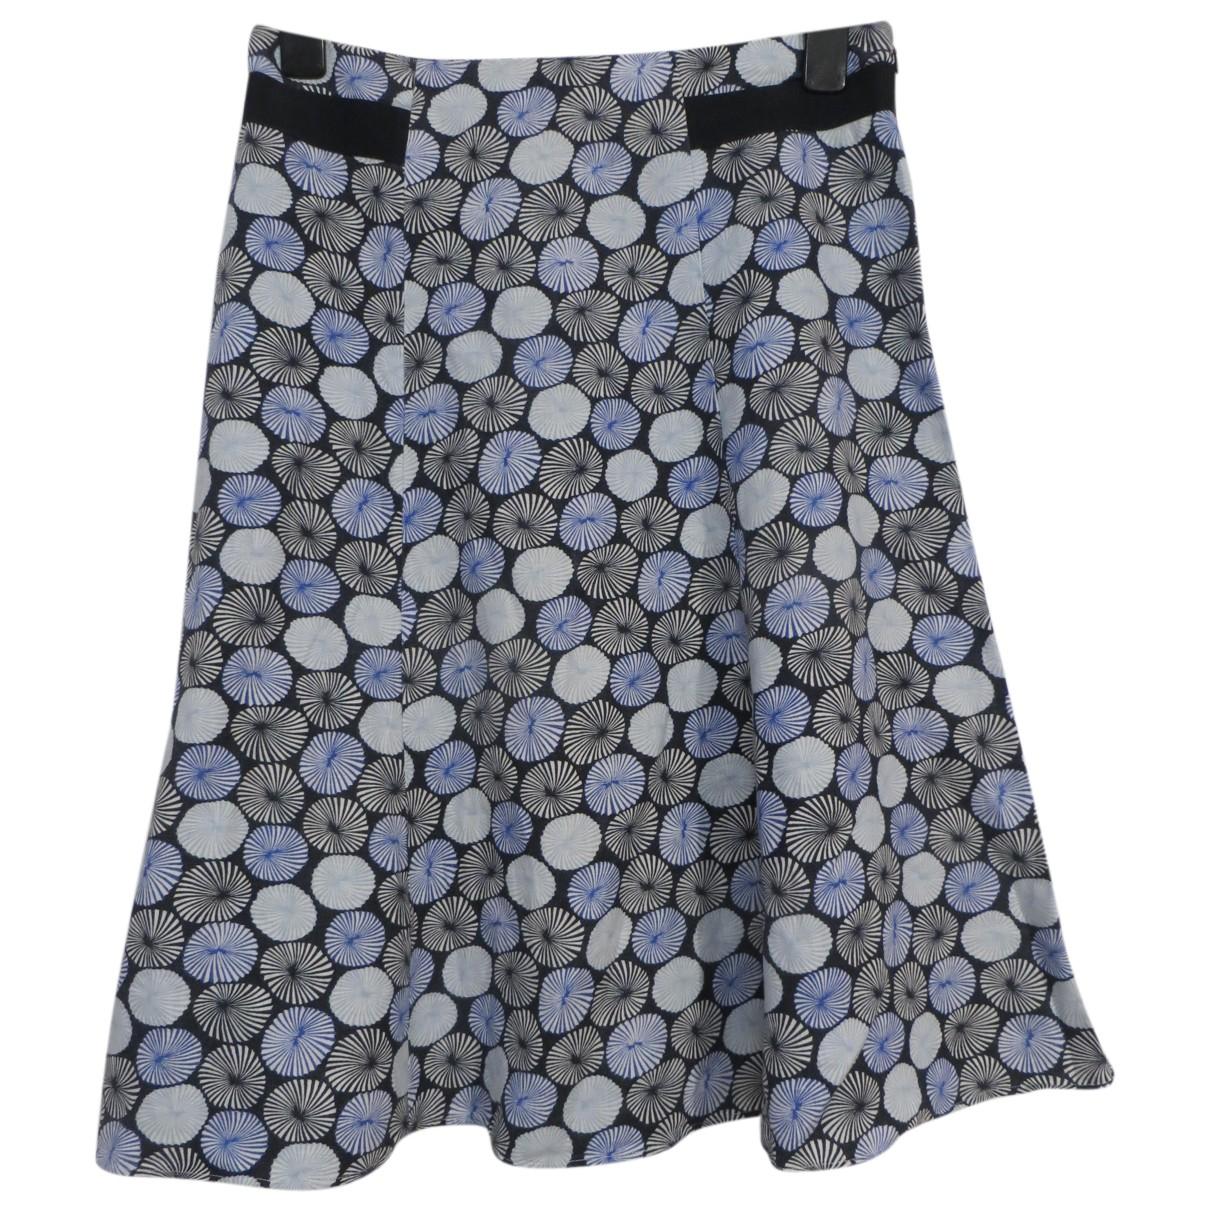 Hobbs - Jupe   pour femme en coton - bleu